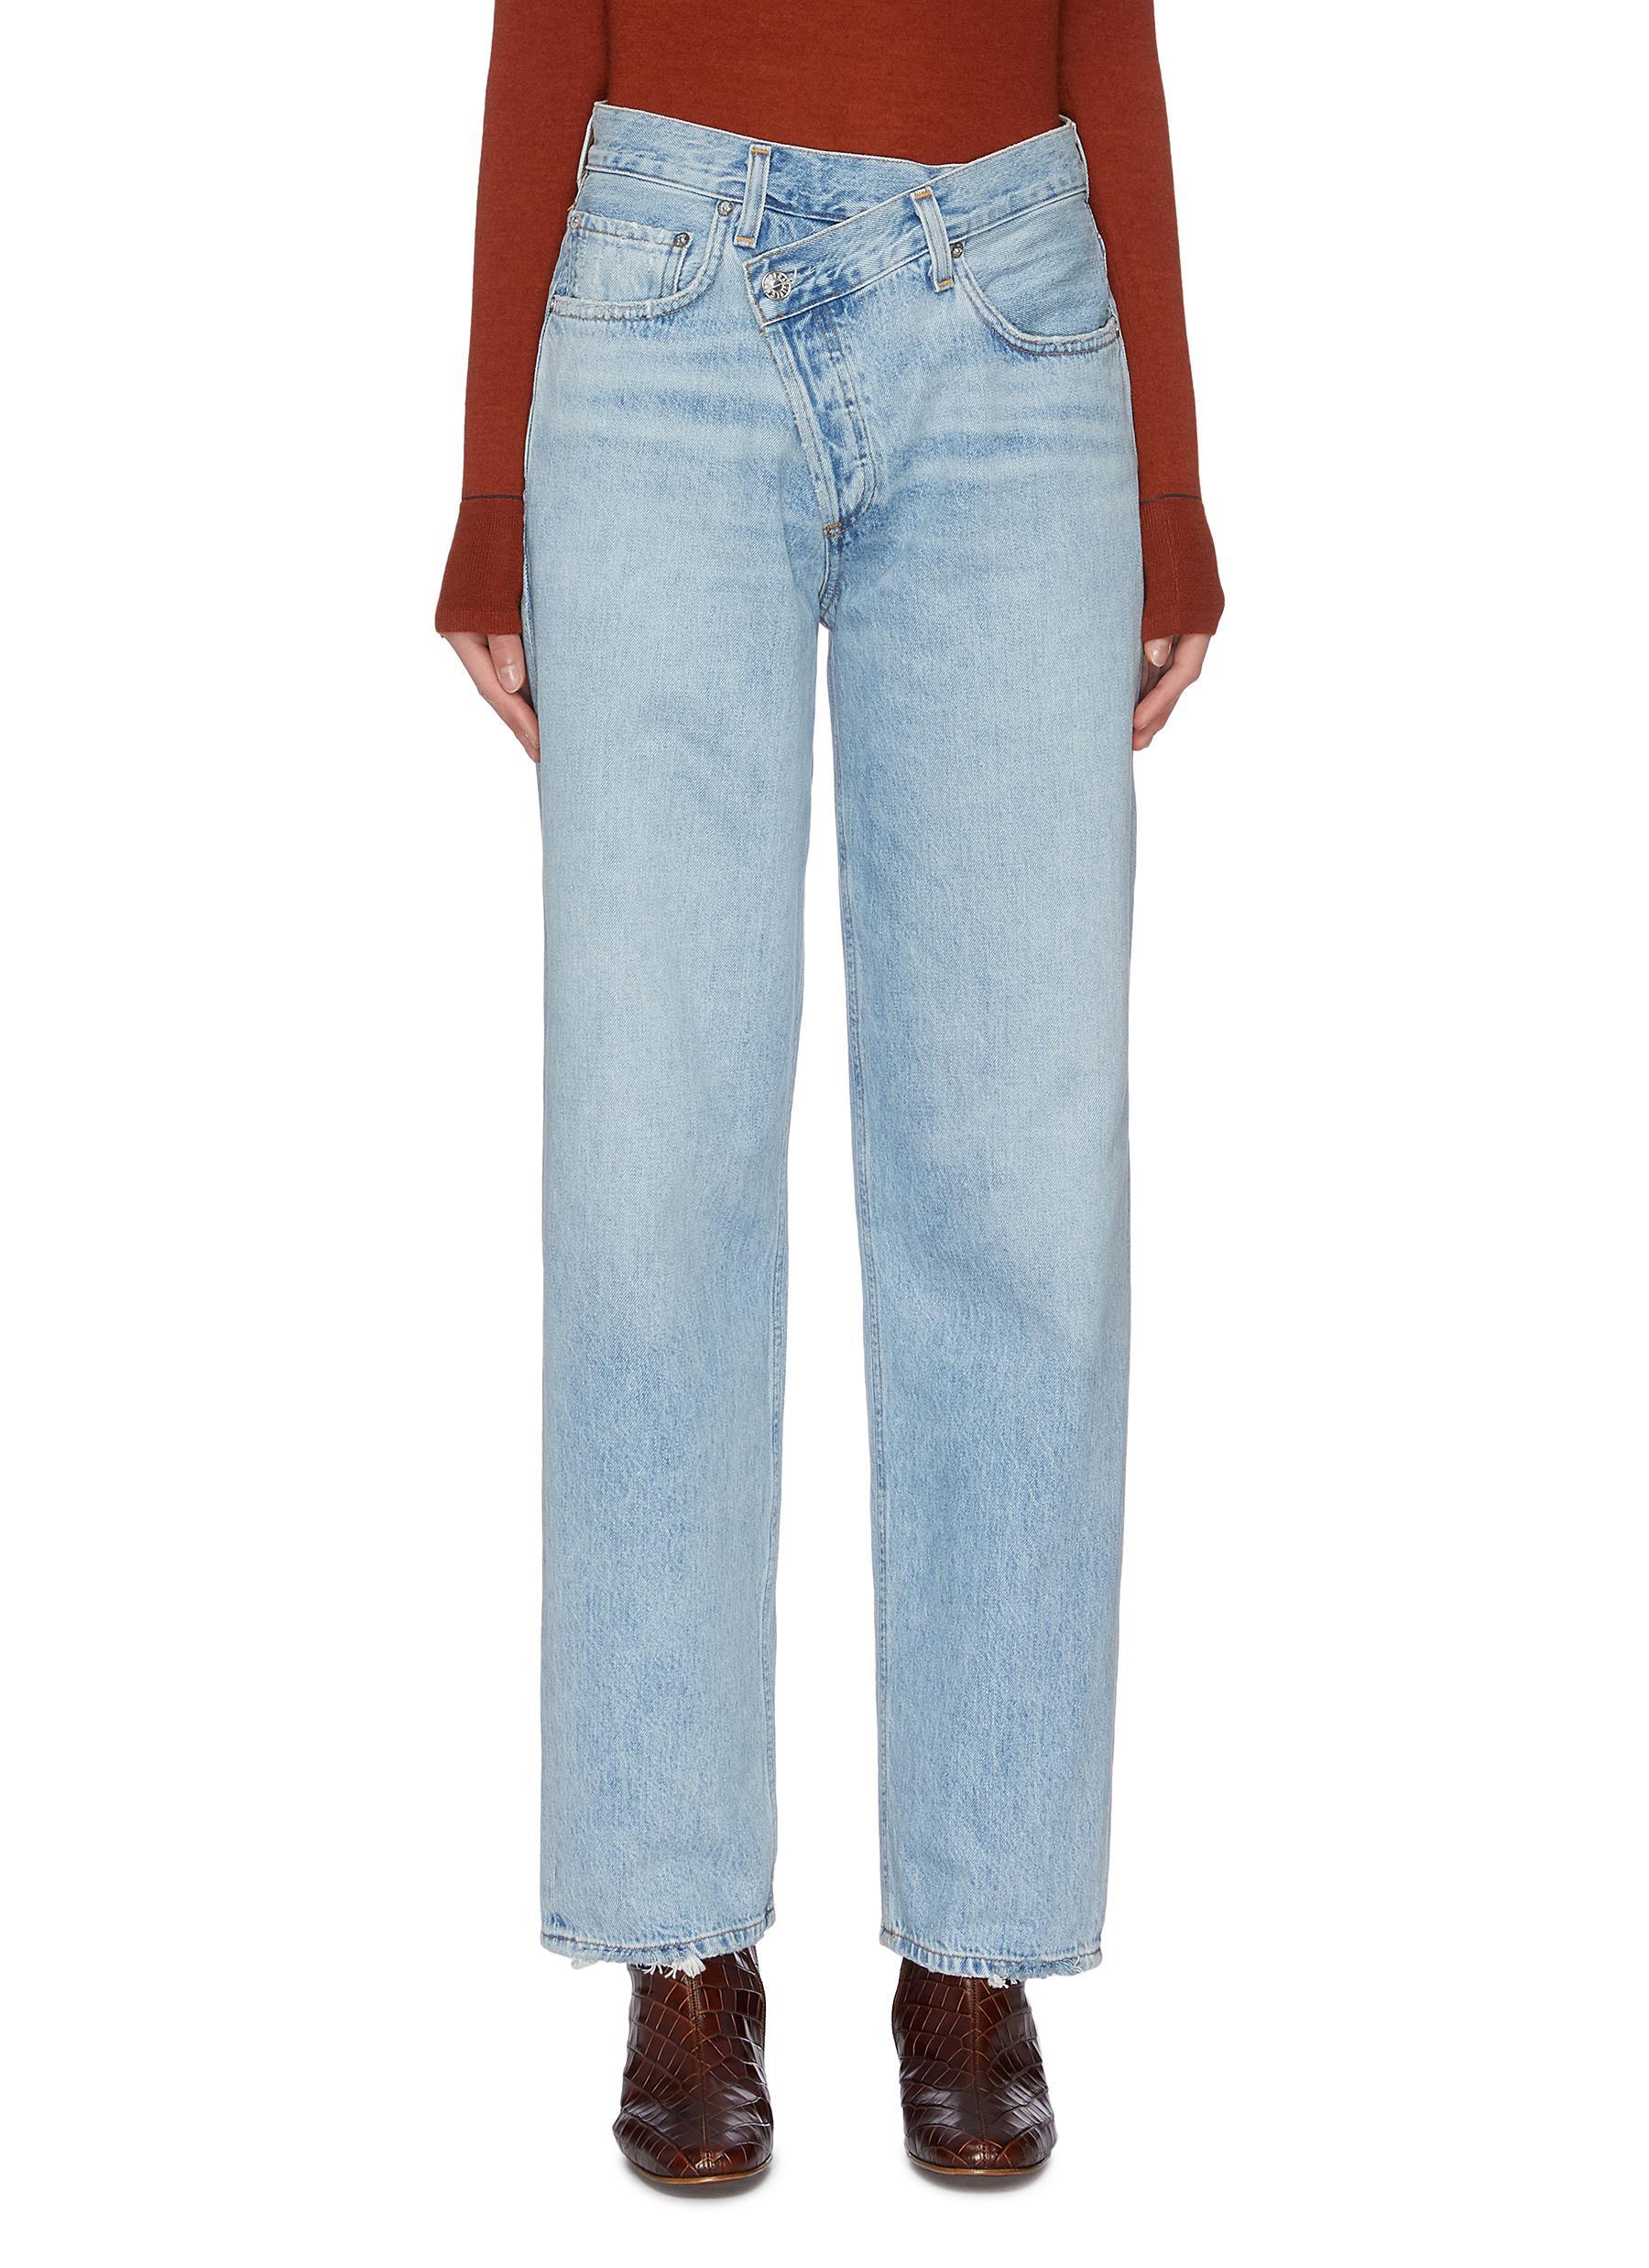 Buy Agolde Jeans 'Criss Cross' straight leg jeans